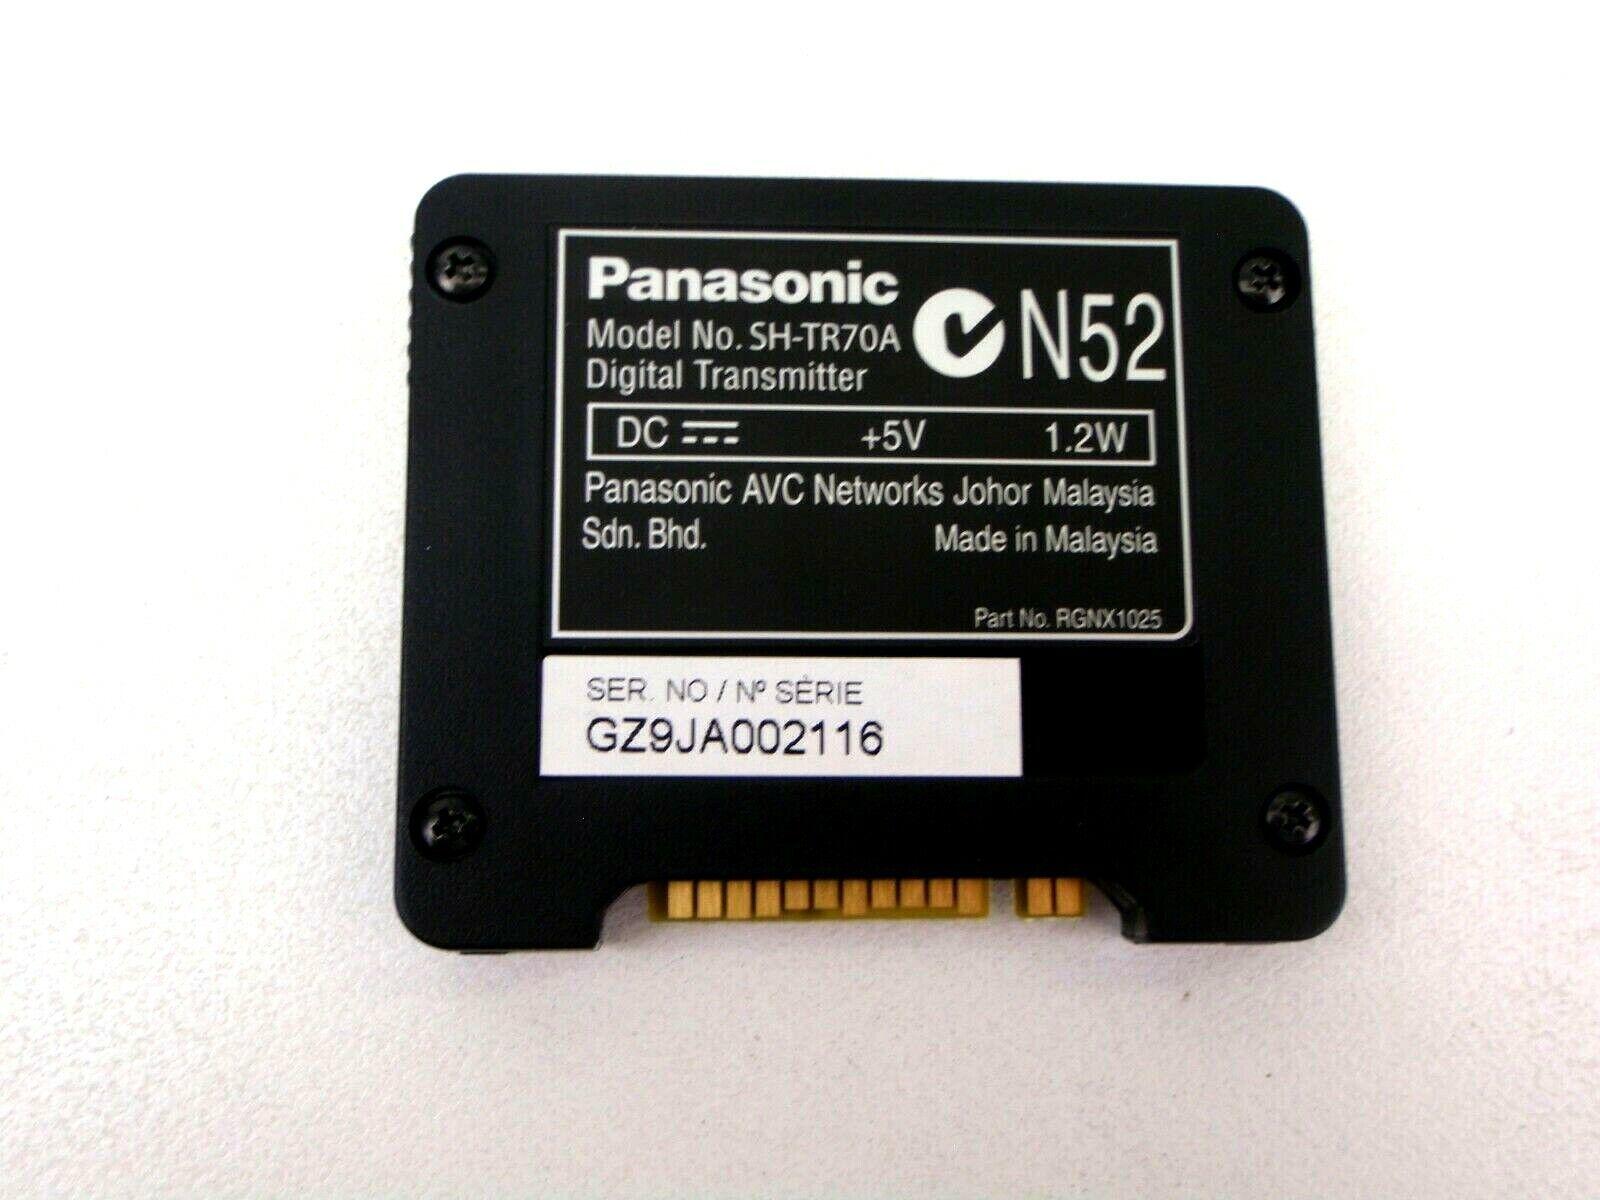 PANASONIC SH-TR70A GENUINE WIRELESS RECEIVER DIGITAL TRANSMITTER CARD